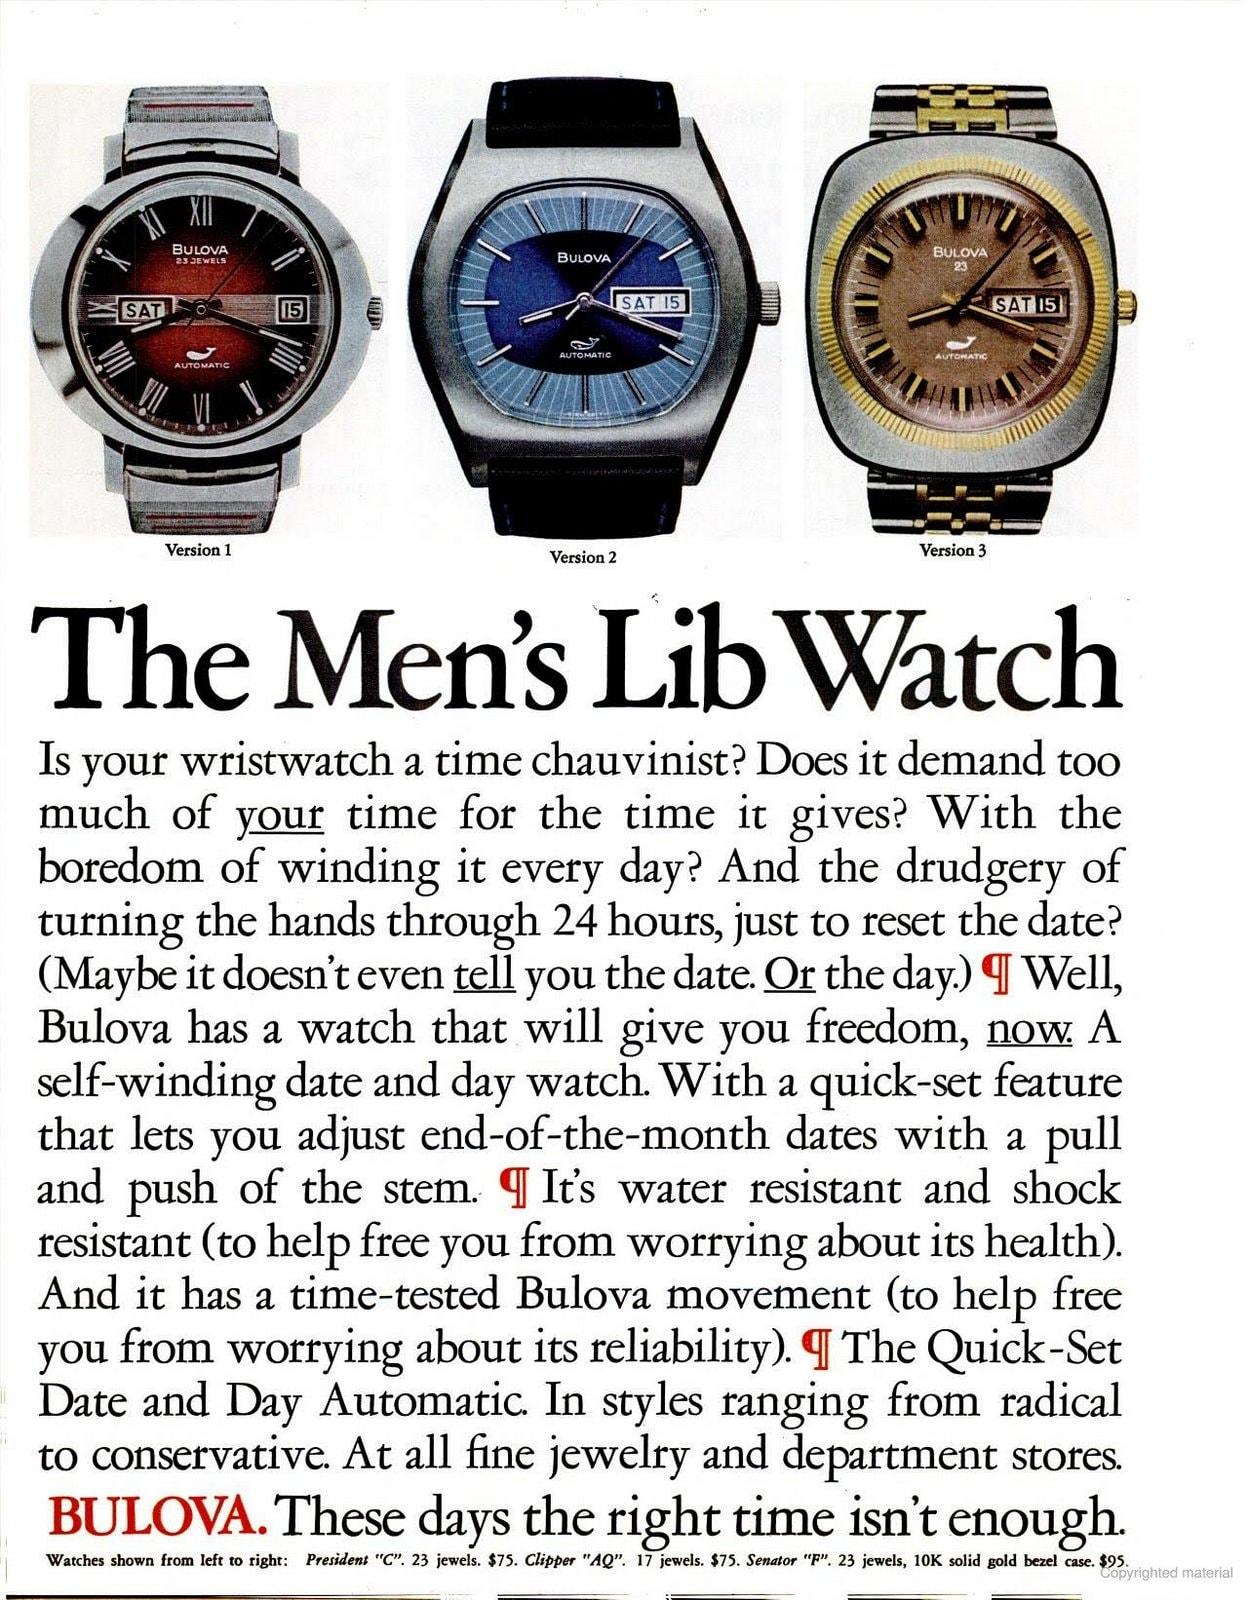 The Bulova Men's Lib Watch (1972)